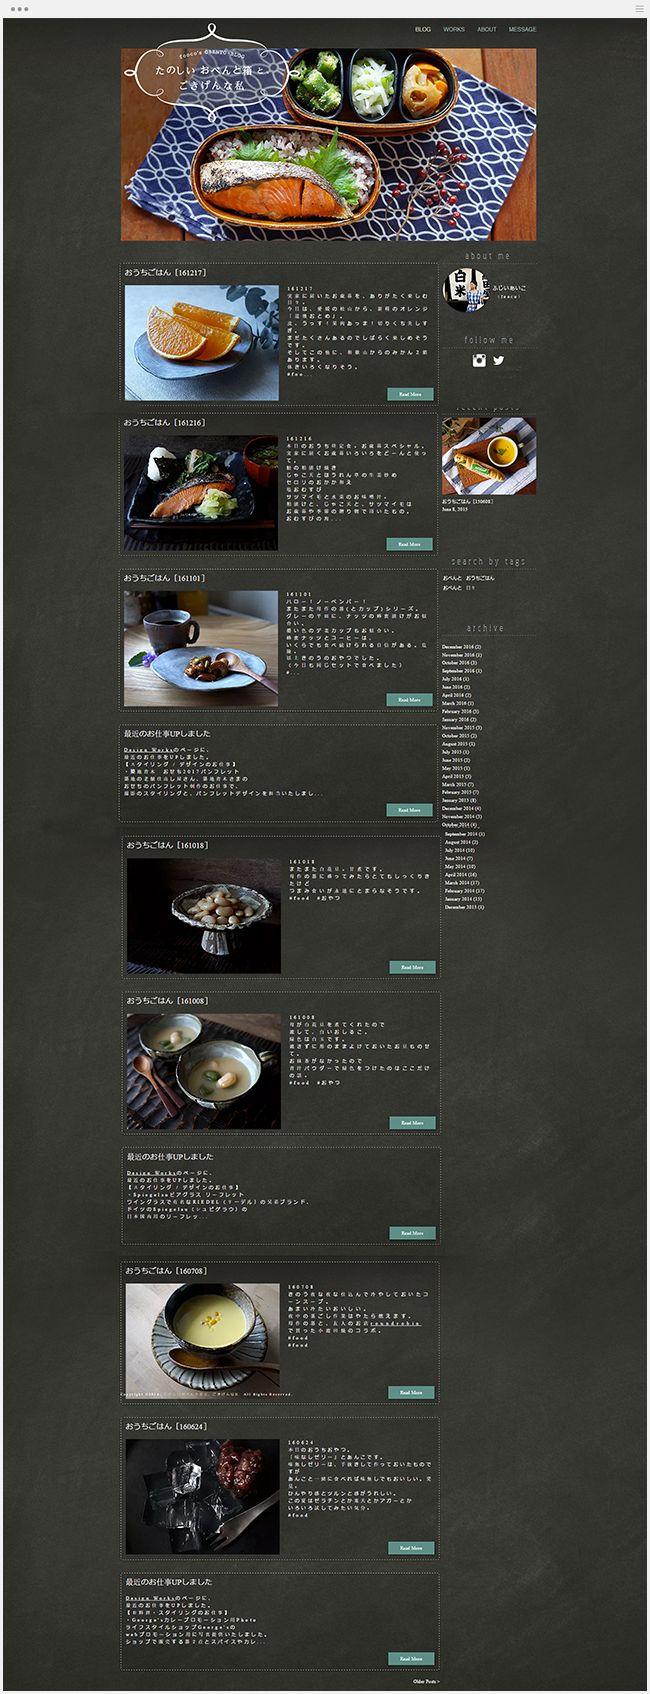 Fooco'a Obento Blog | Blog About Food